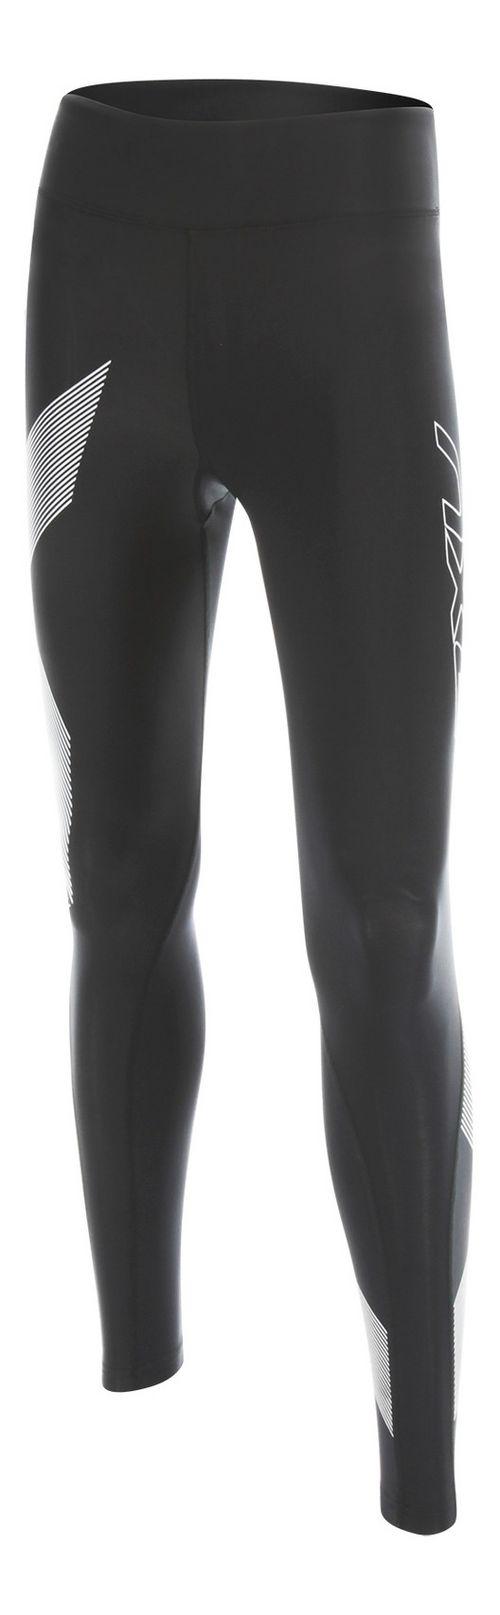 Womens 2XU HYOPTIK Mid-Rise Compression Tights & Leggings Pants - Black/Striped Silver XL